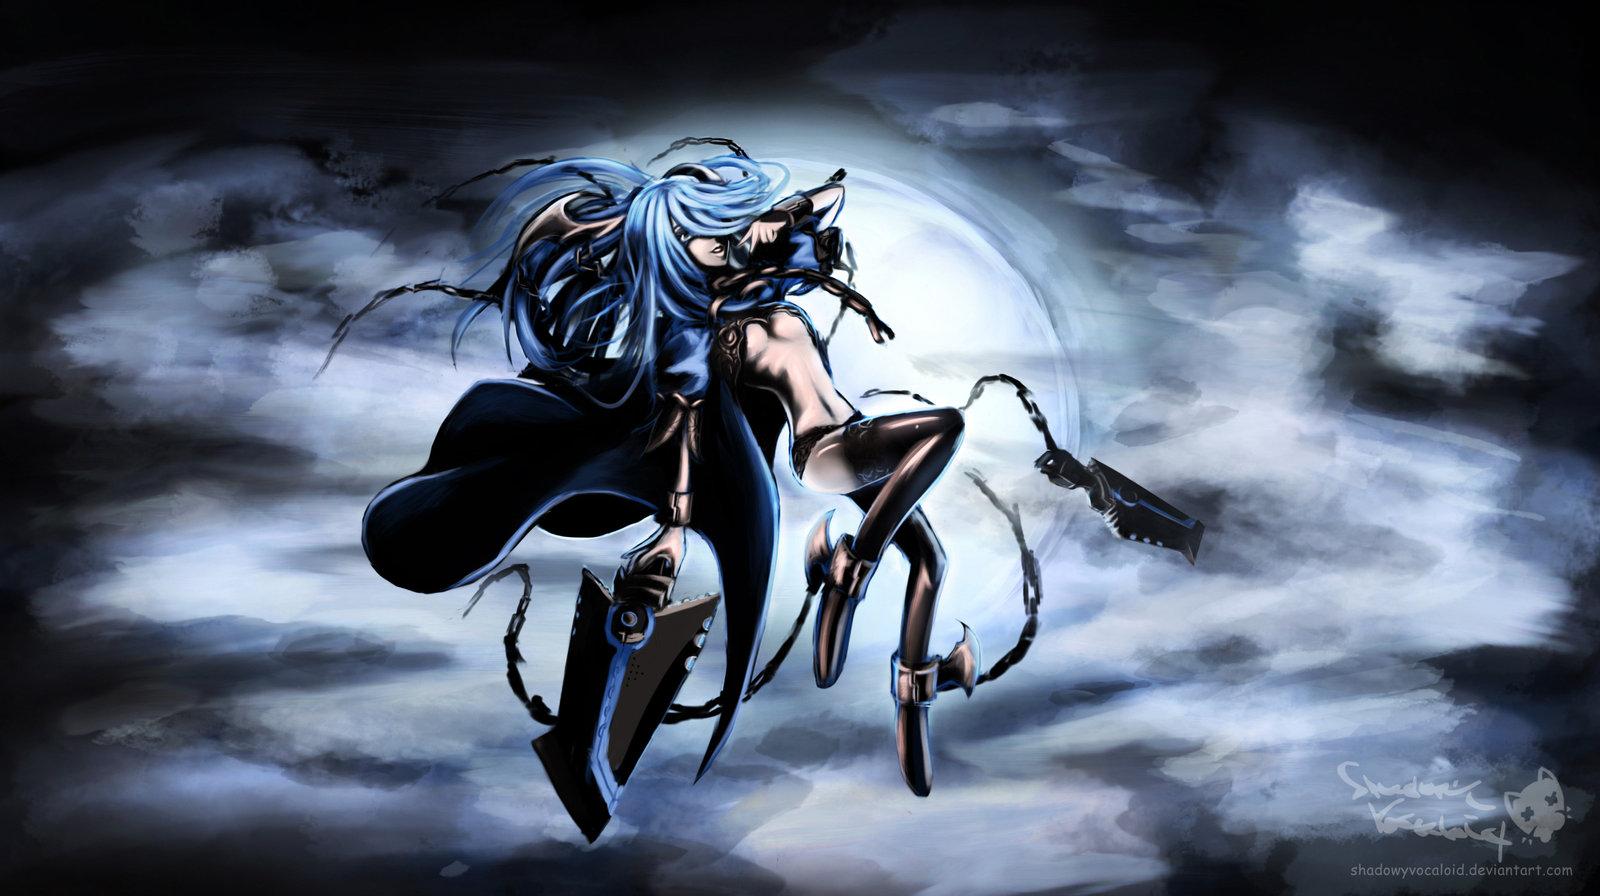 Ophelia (S4 League) - Zerochan Anime Image Board